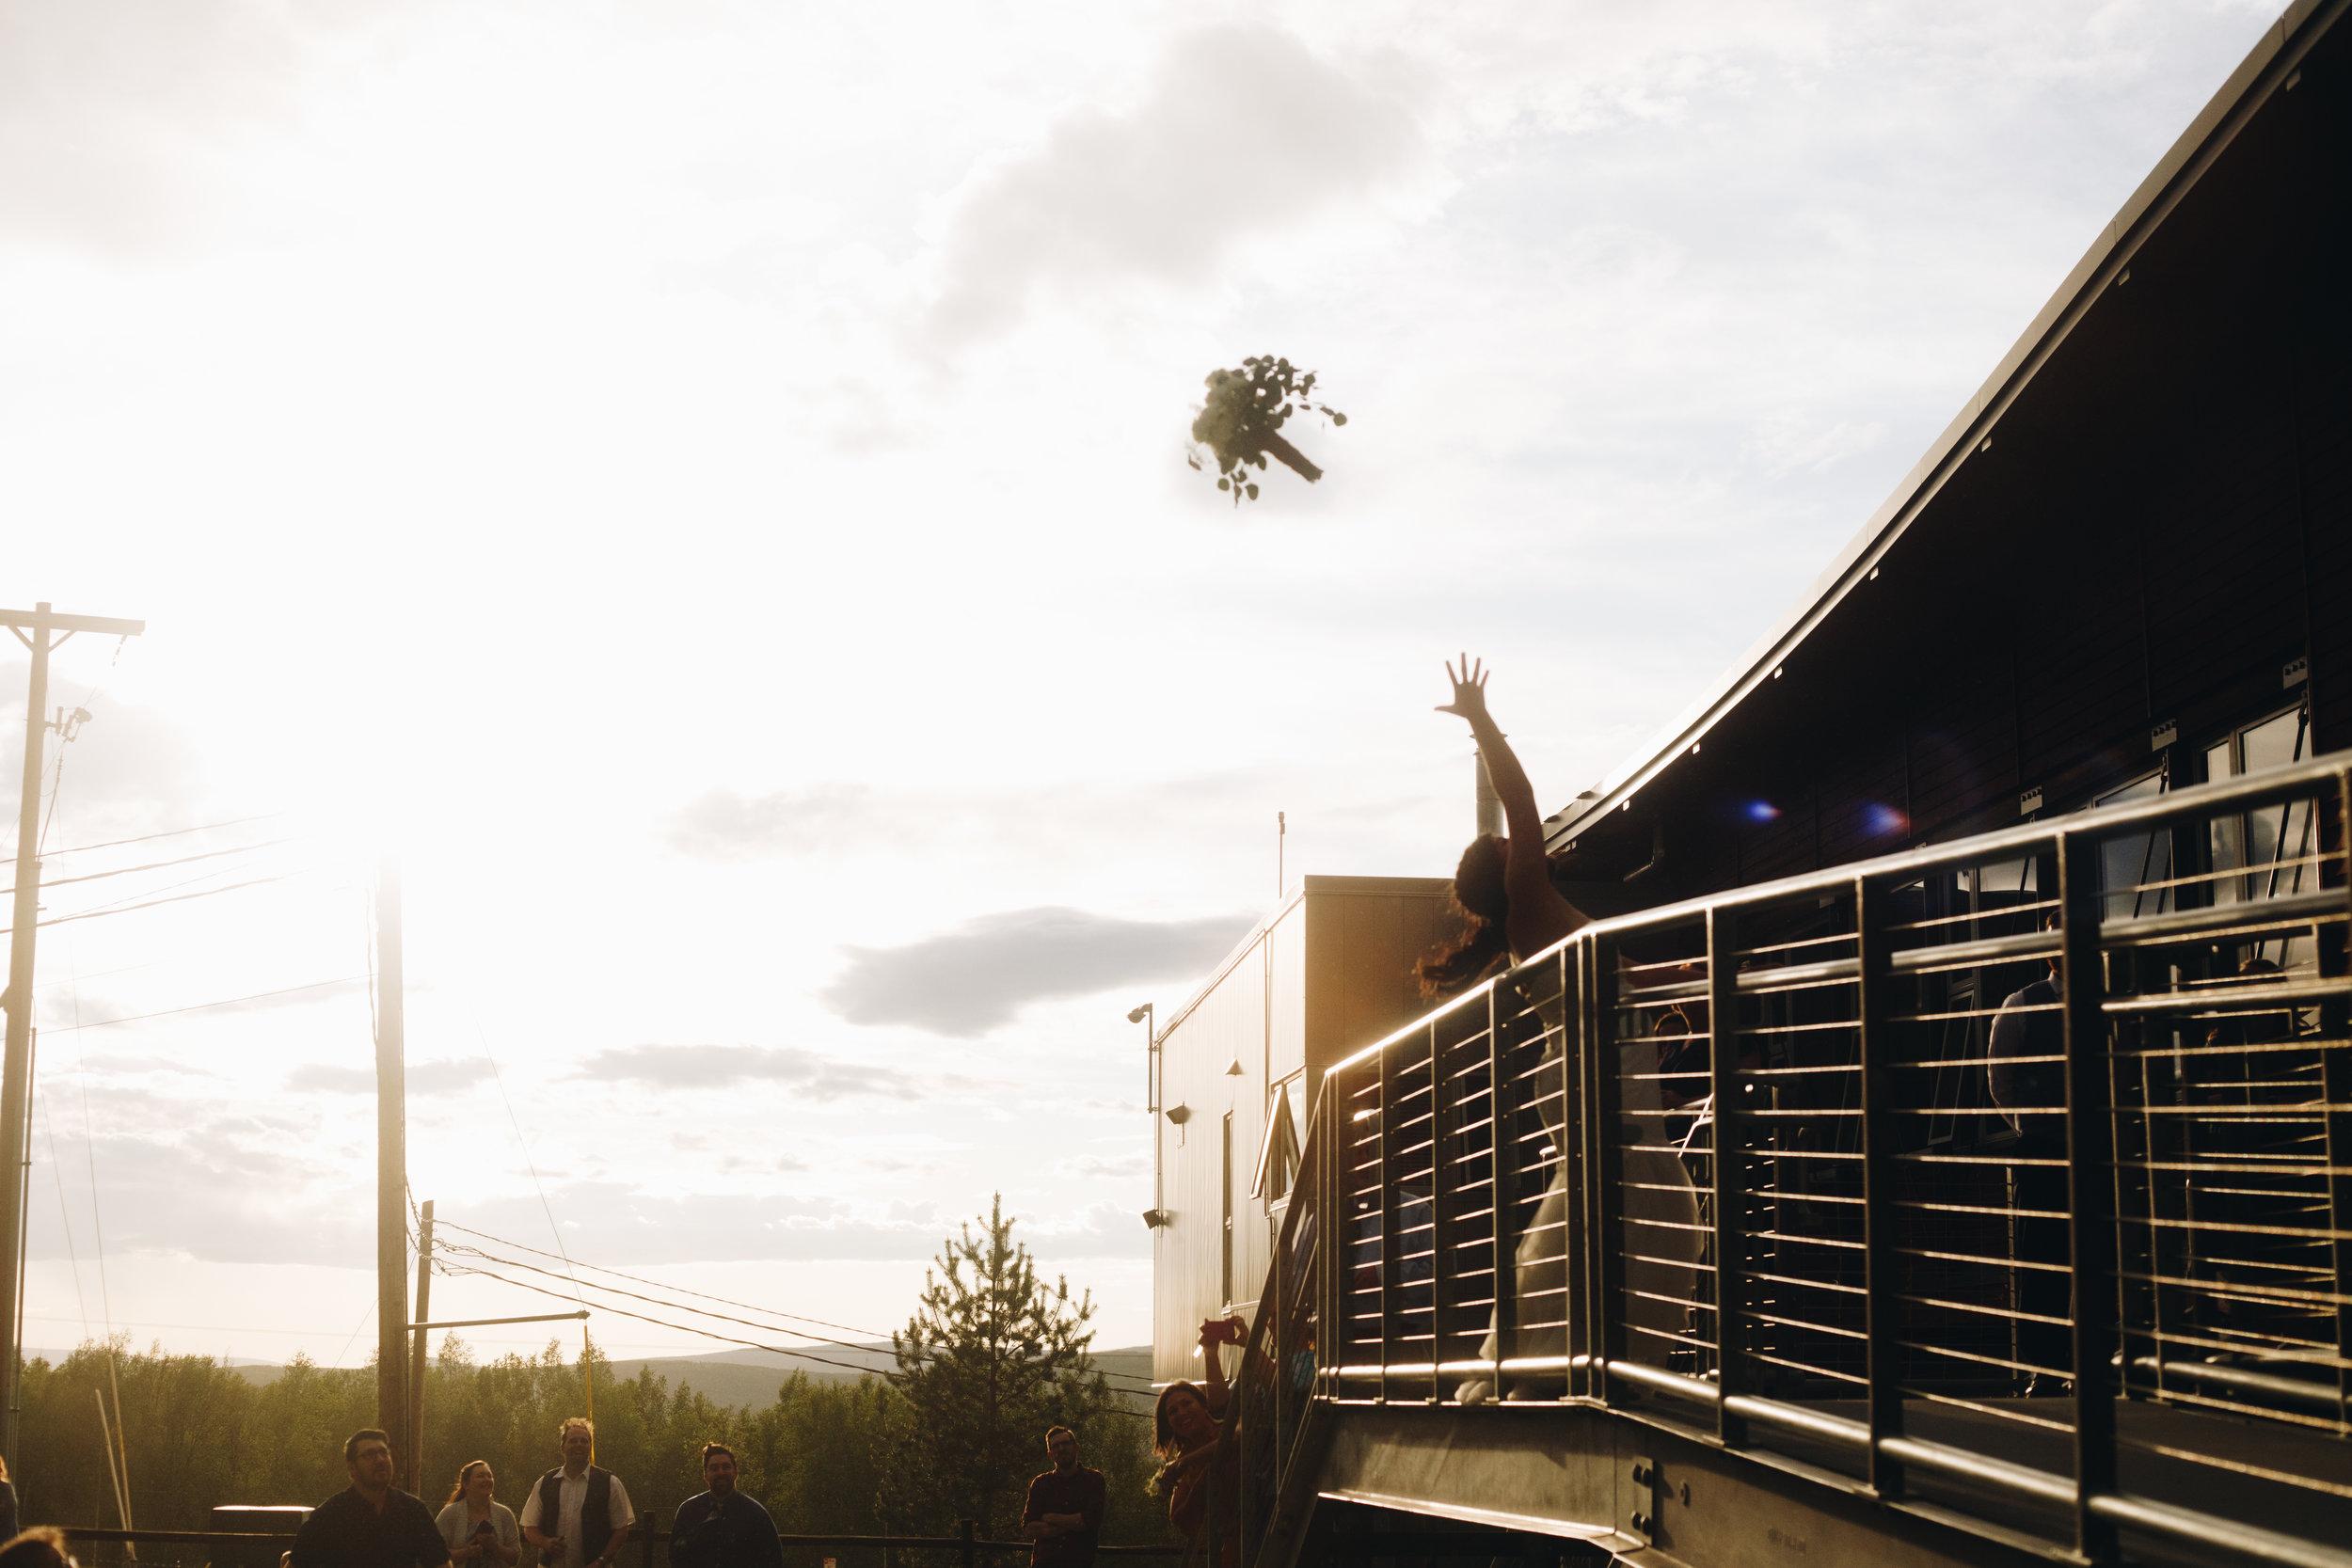 norris teaser-107.jpg